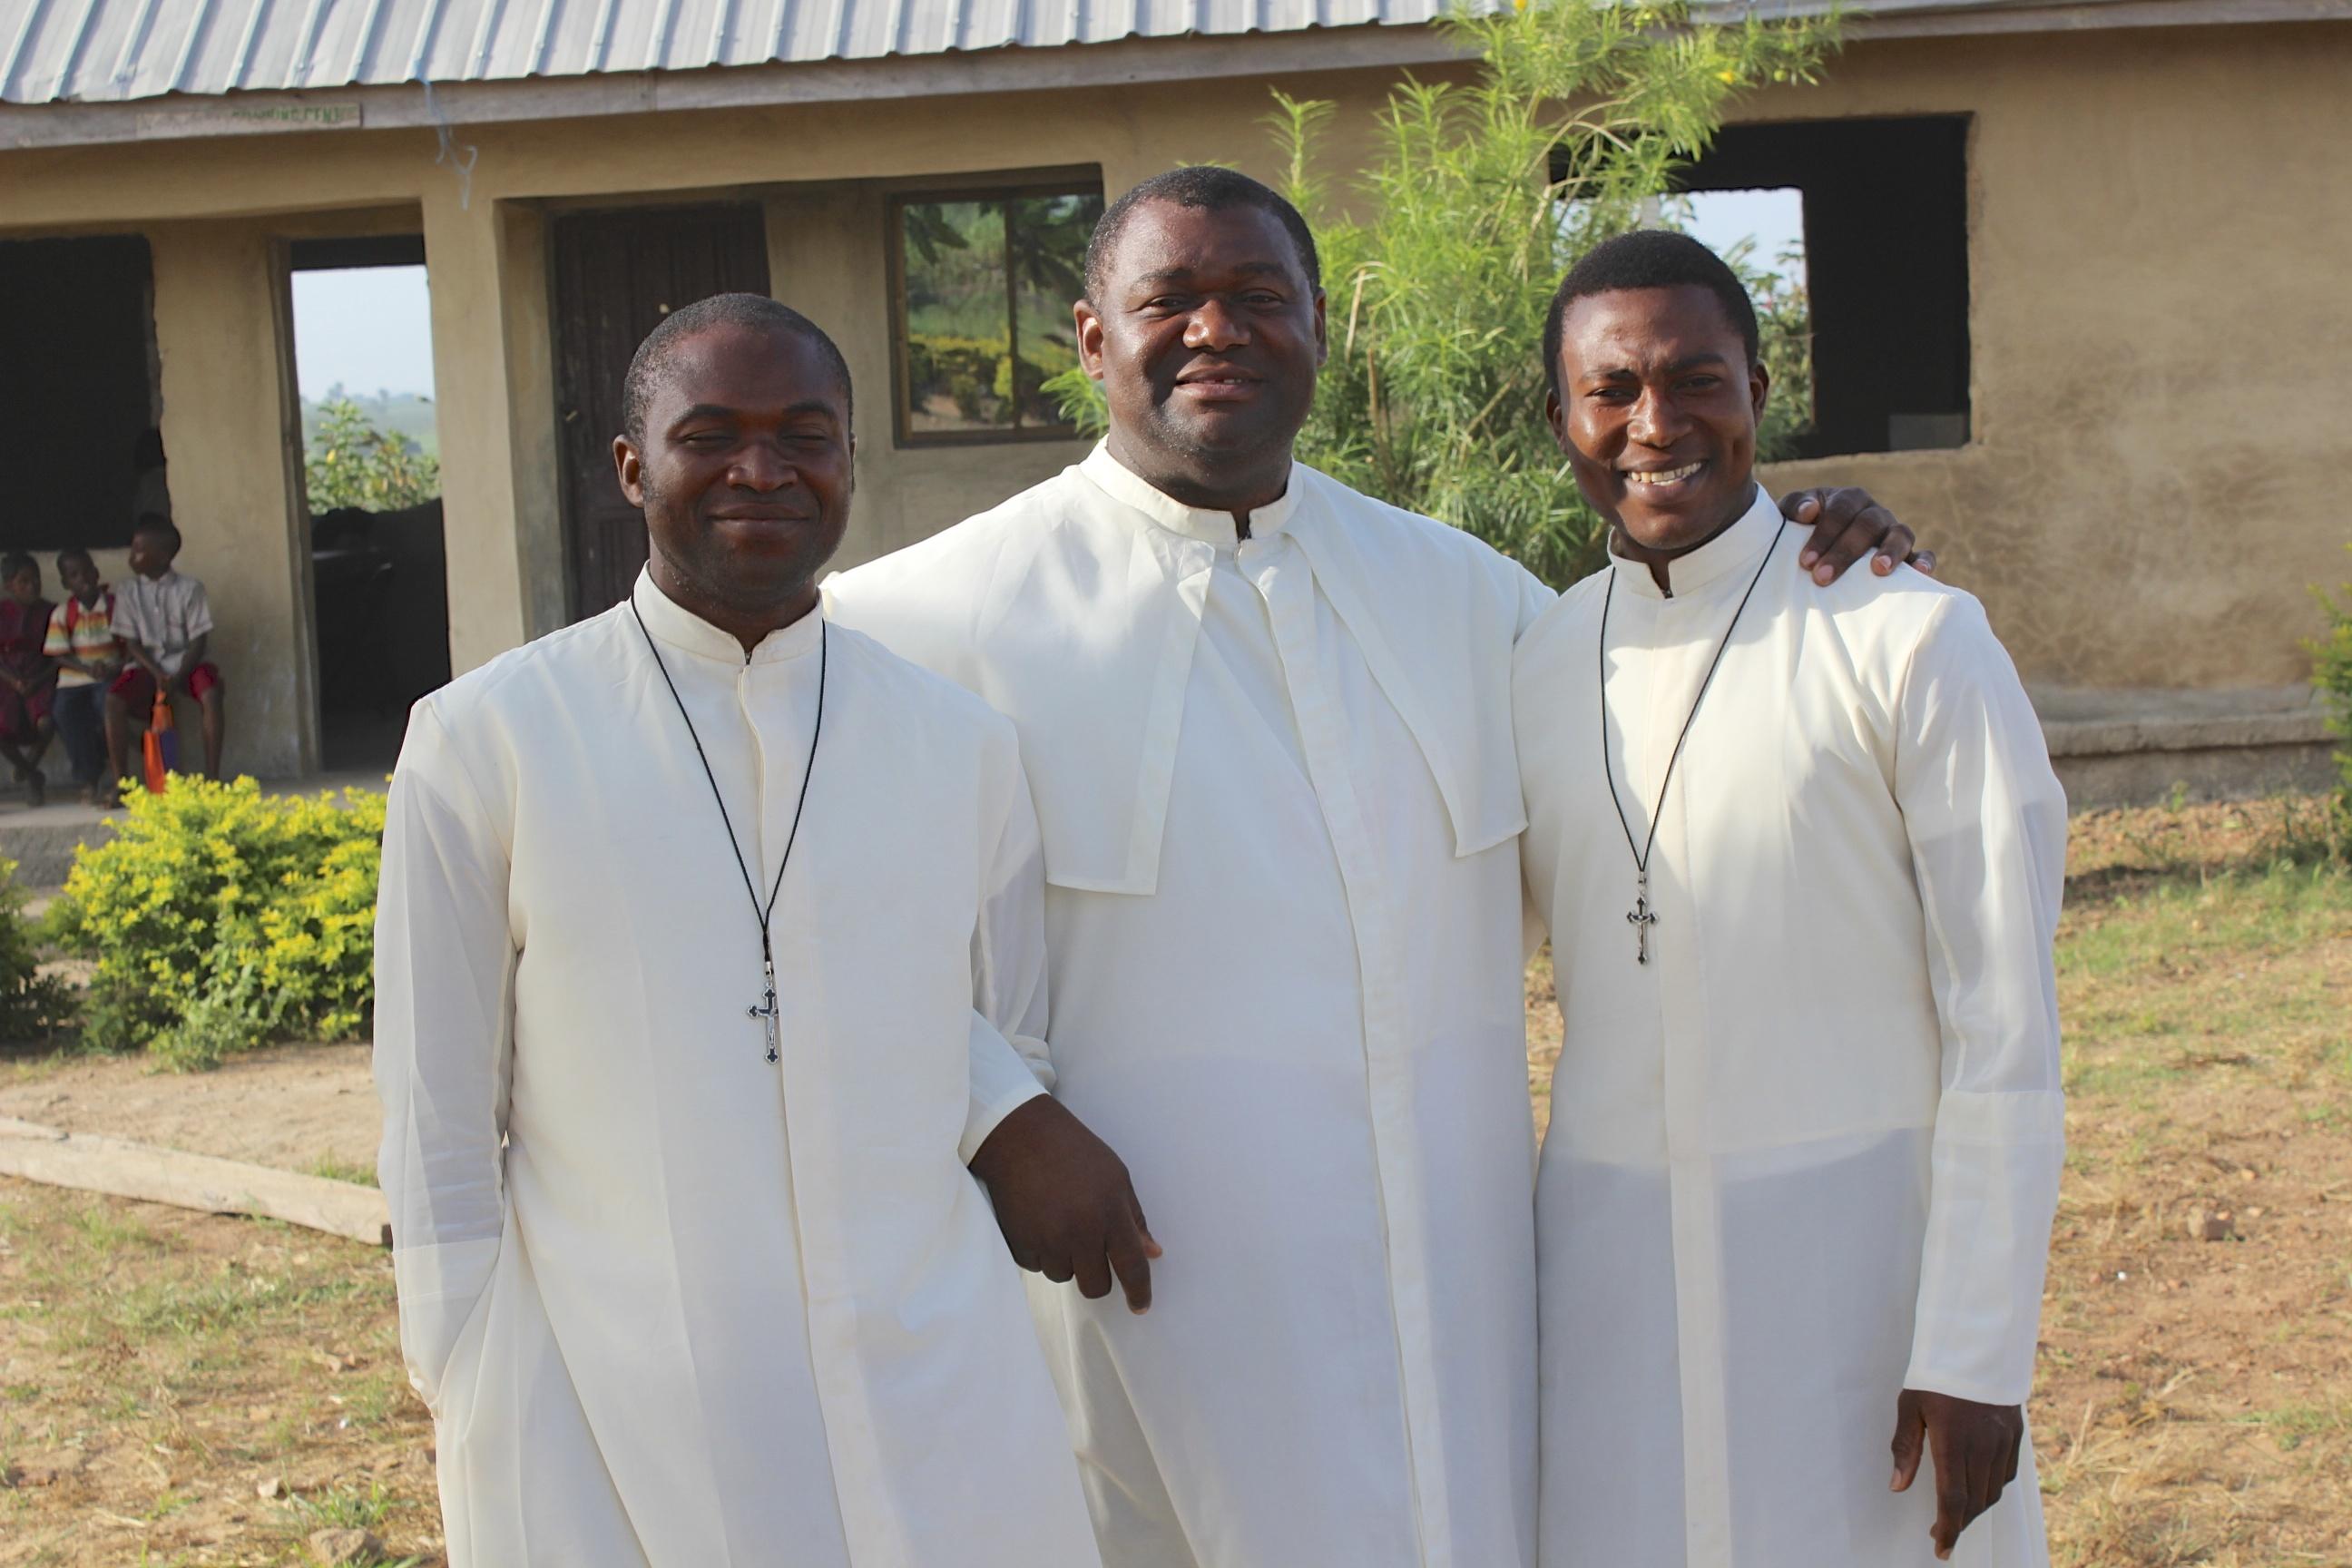 Basilmary, Fr. Vitalis and Dominic